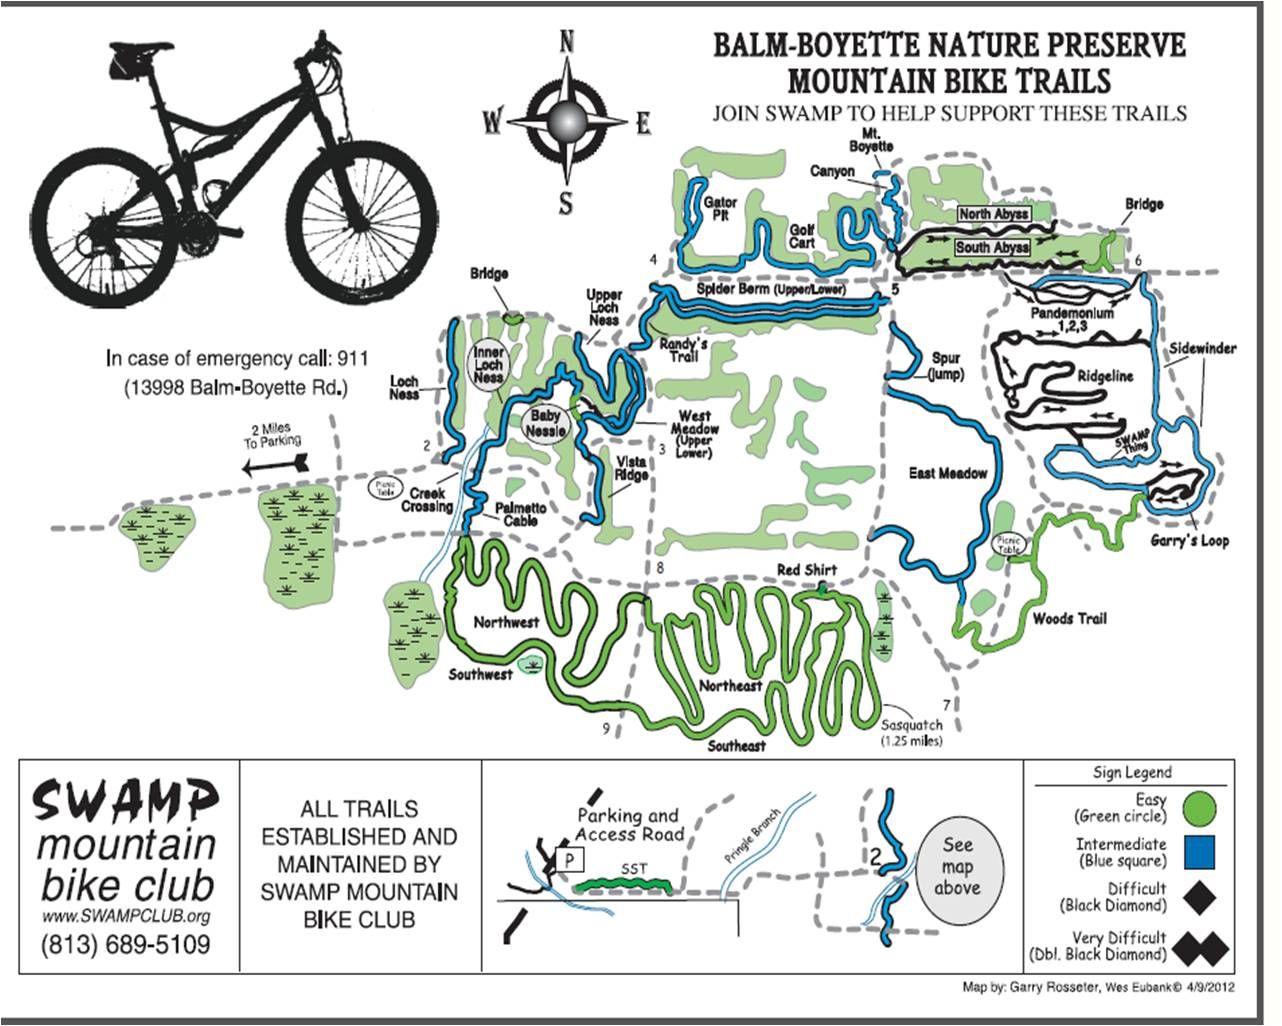 Balm Boyette crazy awesome MTB trails near Tampa, Florida